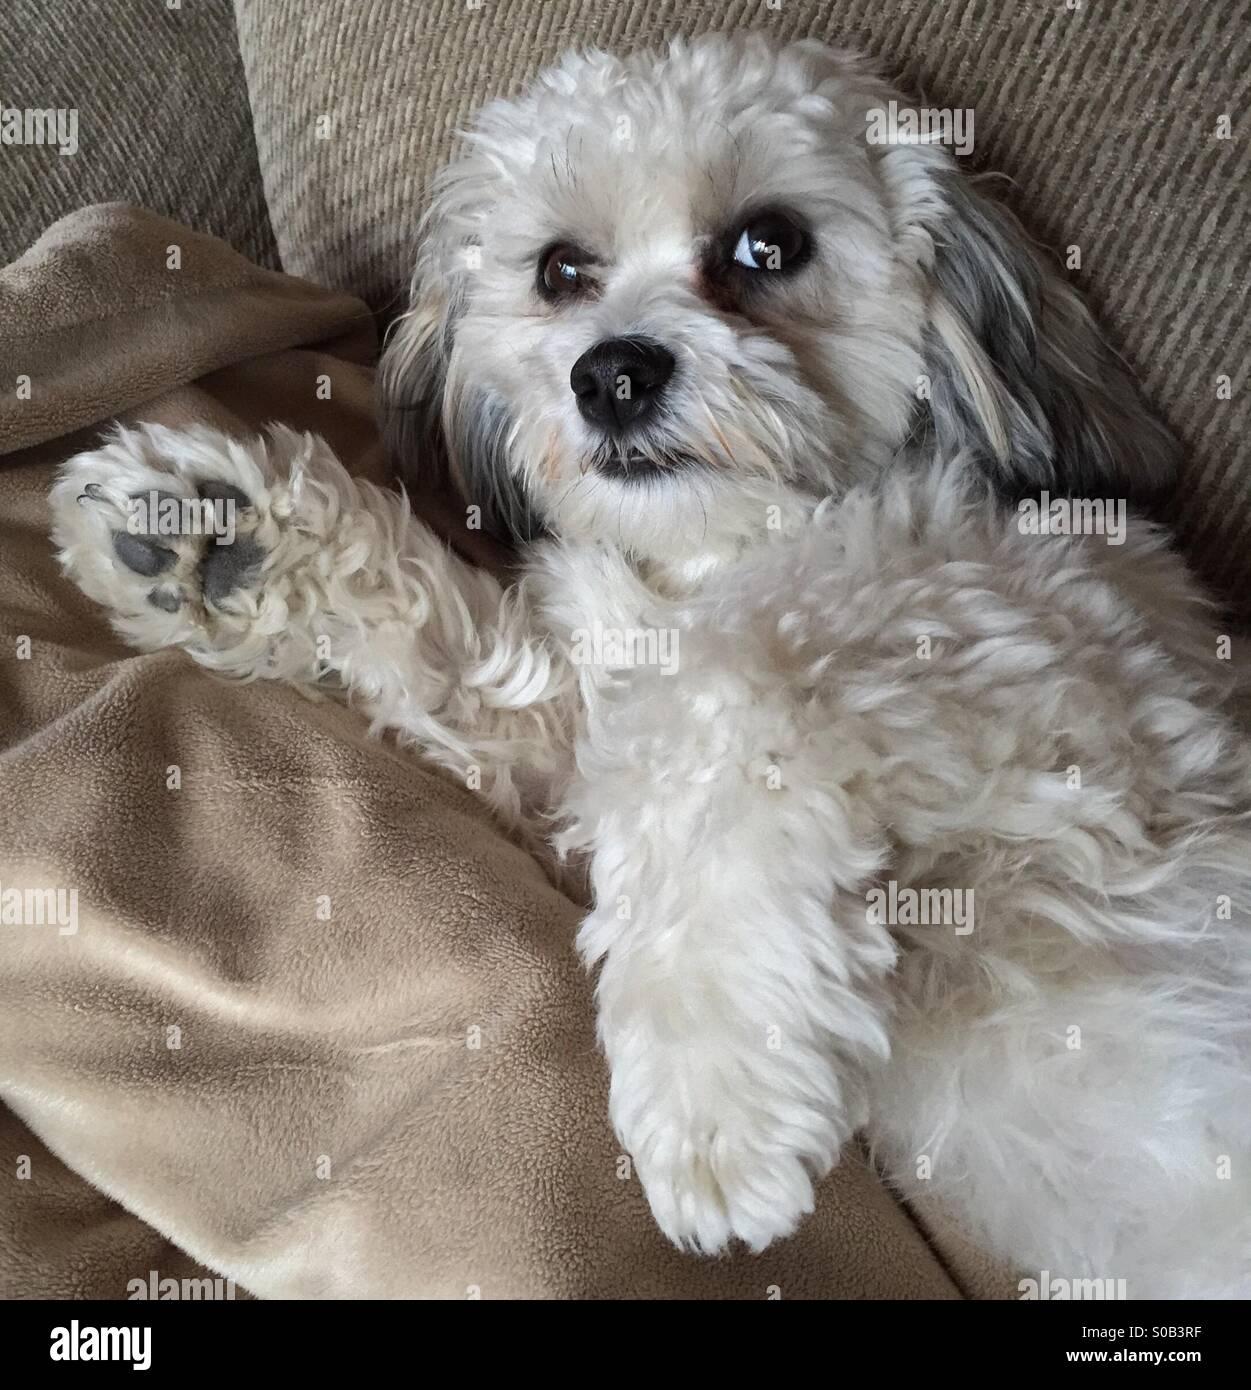 Shih Tzu Bichon Frise Mixed Breed Dog Posing For Photo While